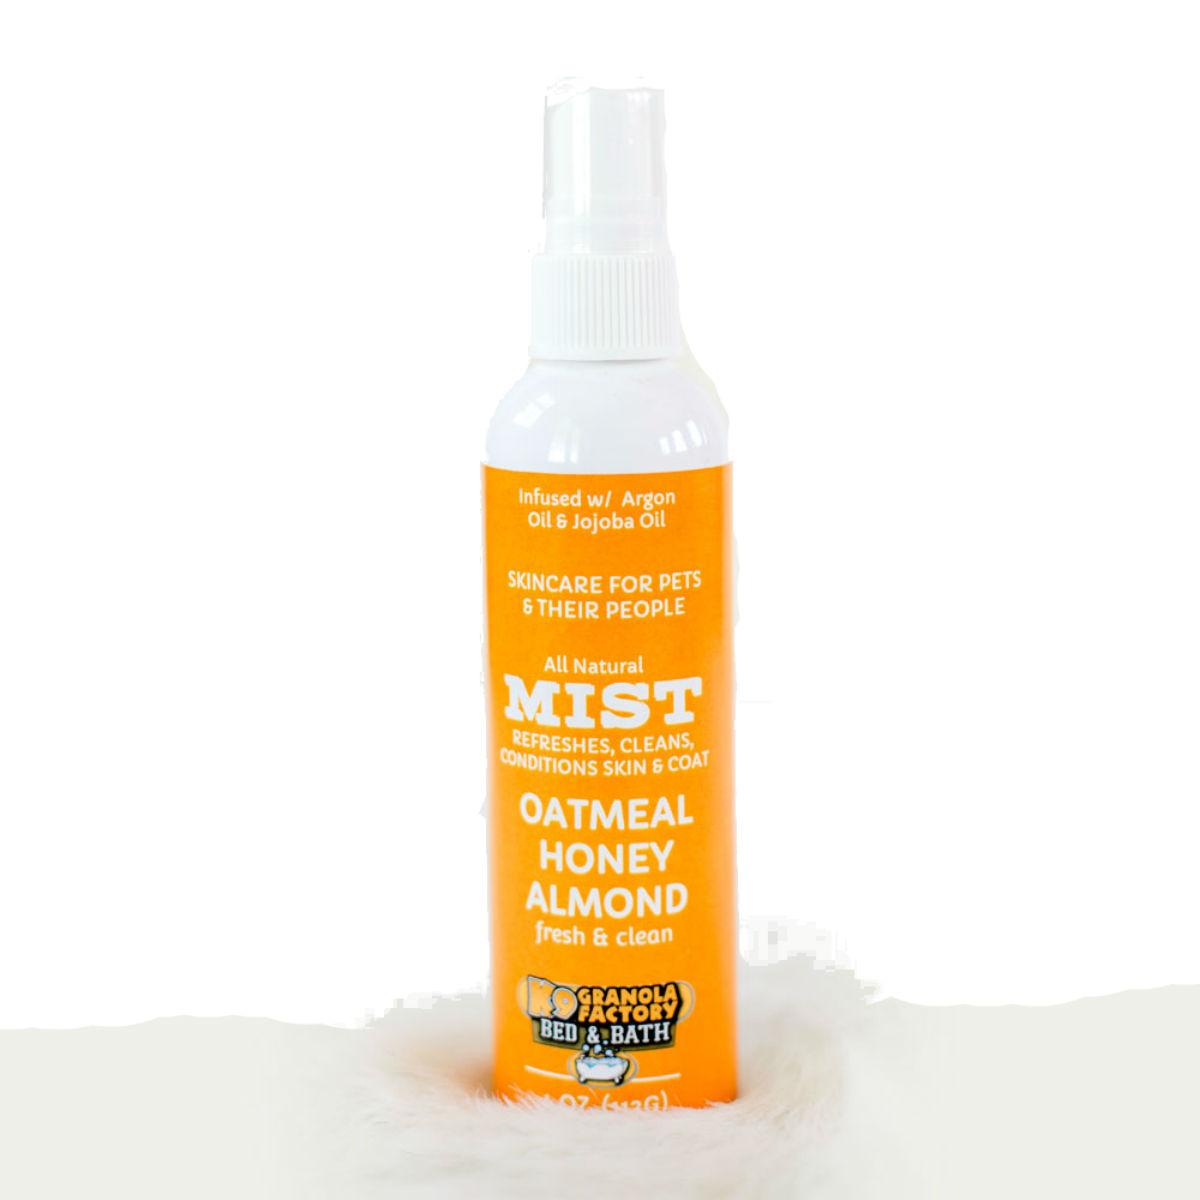 K9 Granola Factory Oatmeal Honey Almond Dog Body Mist